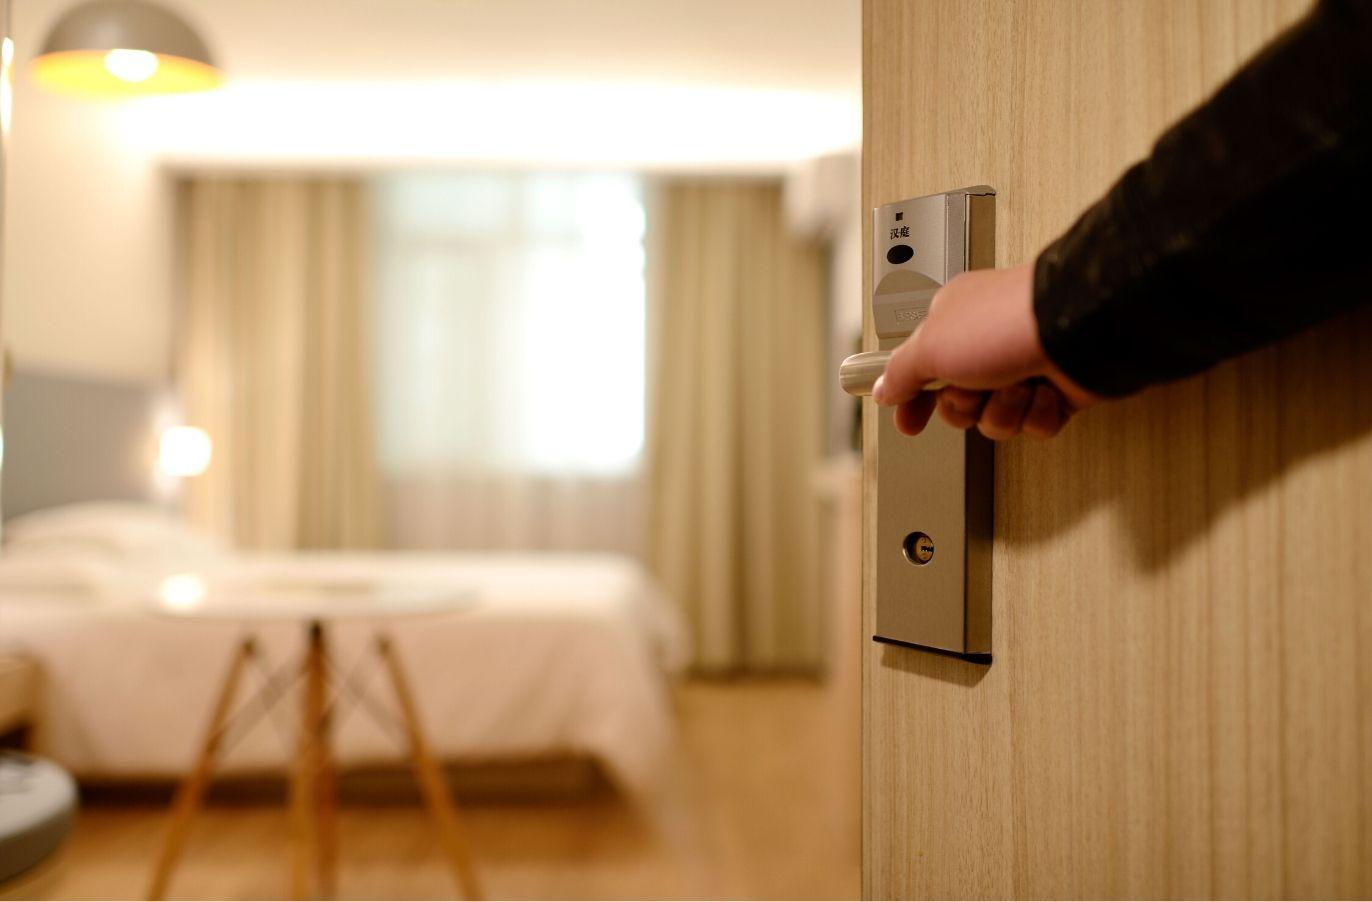 hand opening door into modern hotel room with bed